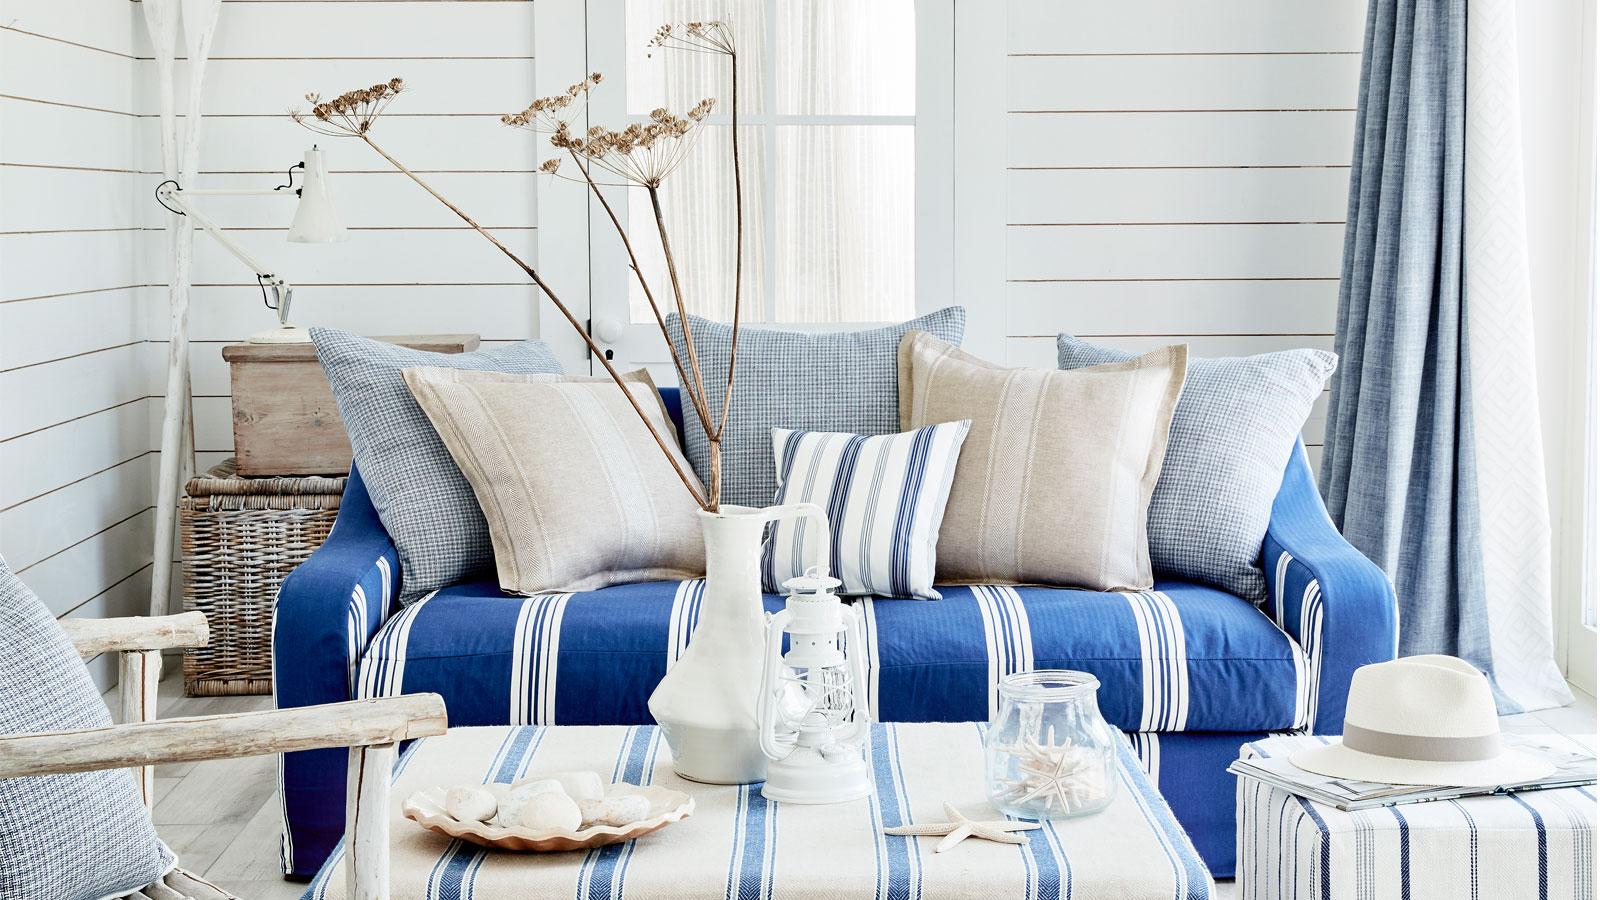 Ian-Mankin-Coast--Living-Room-Lytham-Sofa-1600x900px.jpg